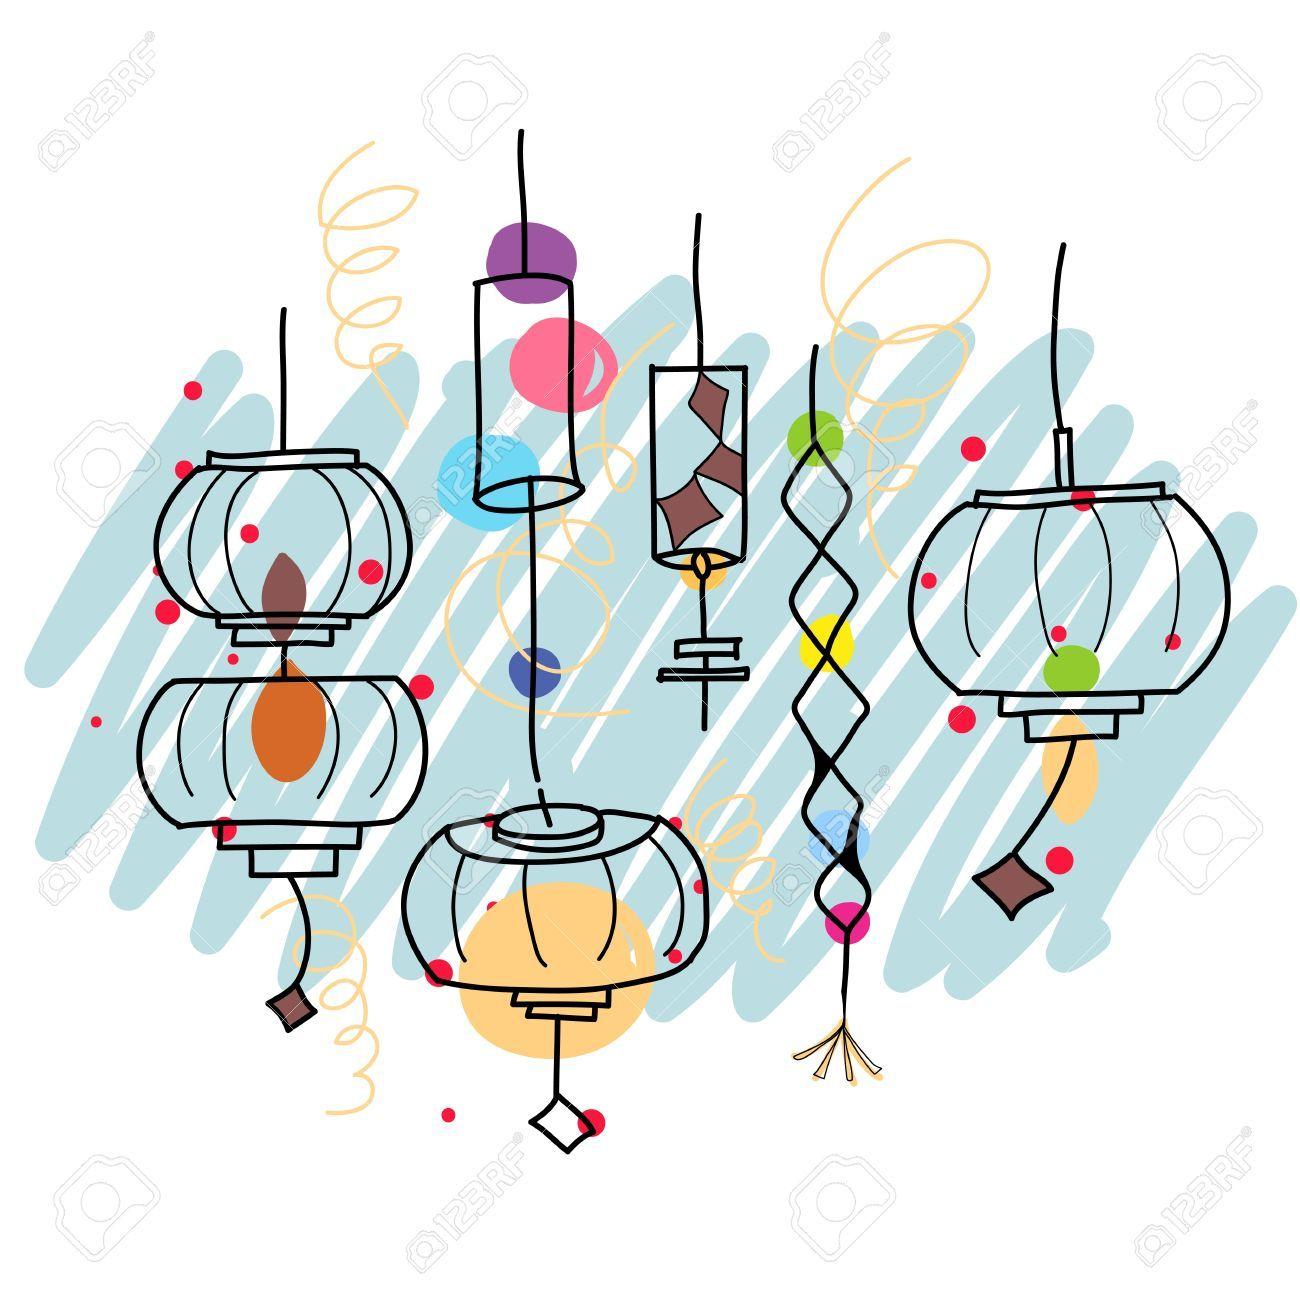 lanterns illustration - Google Search | Lantern ...